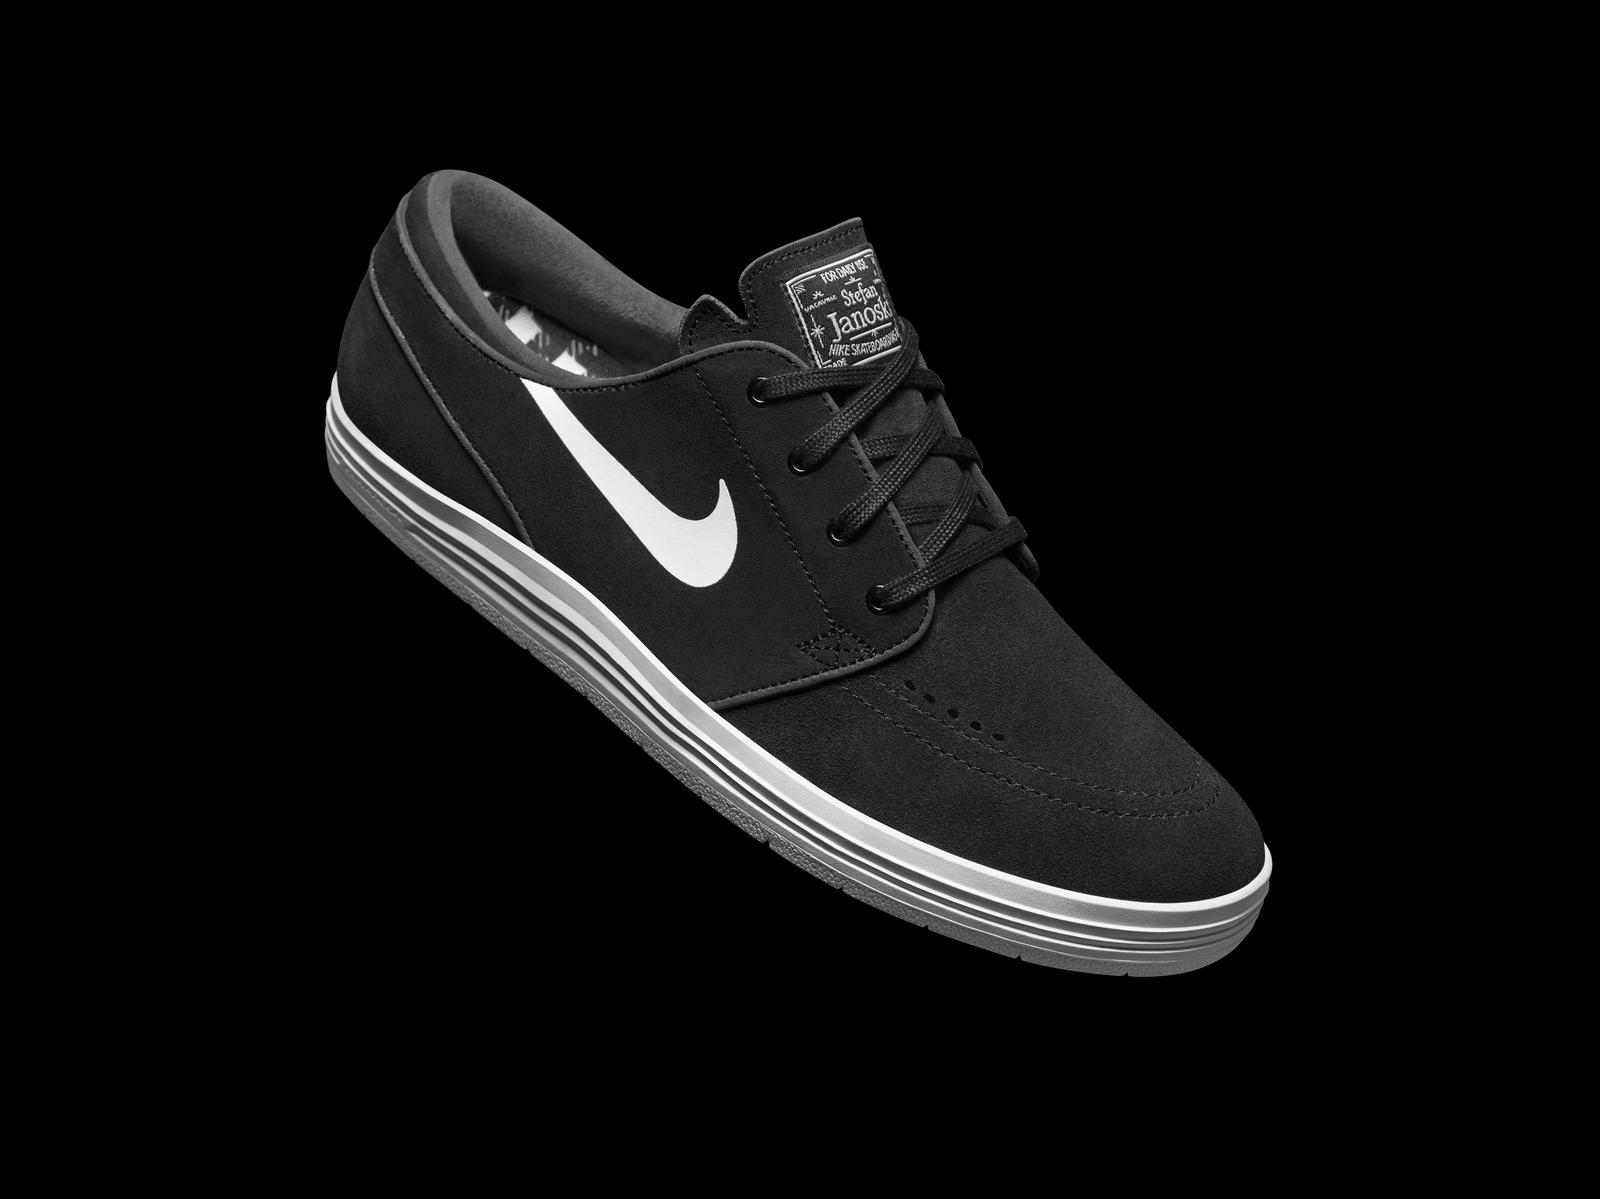 Nike Sb Stefan Janoski Skateboarding Shoes